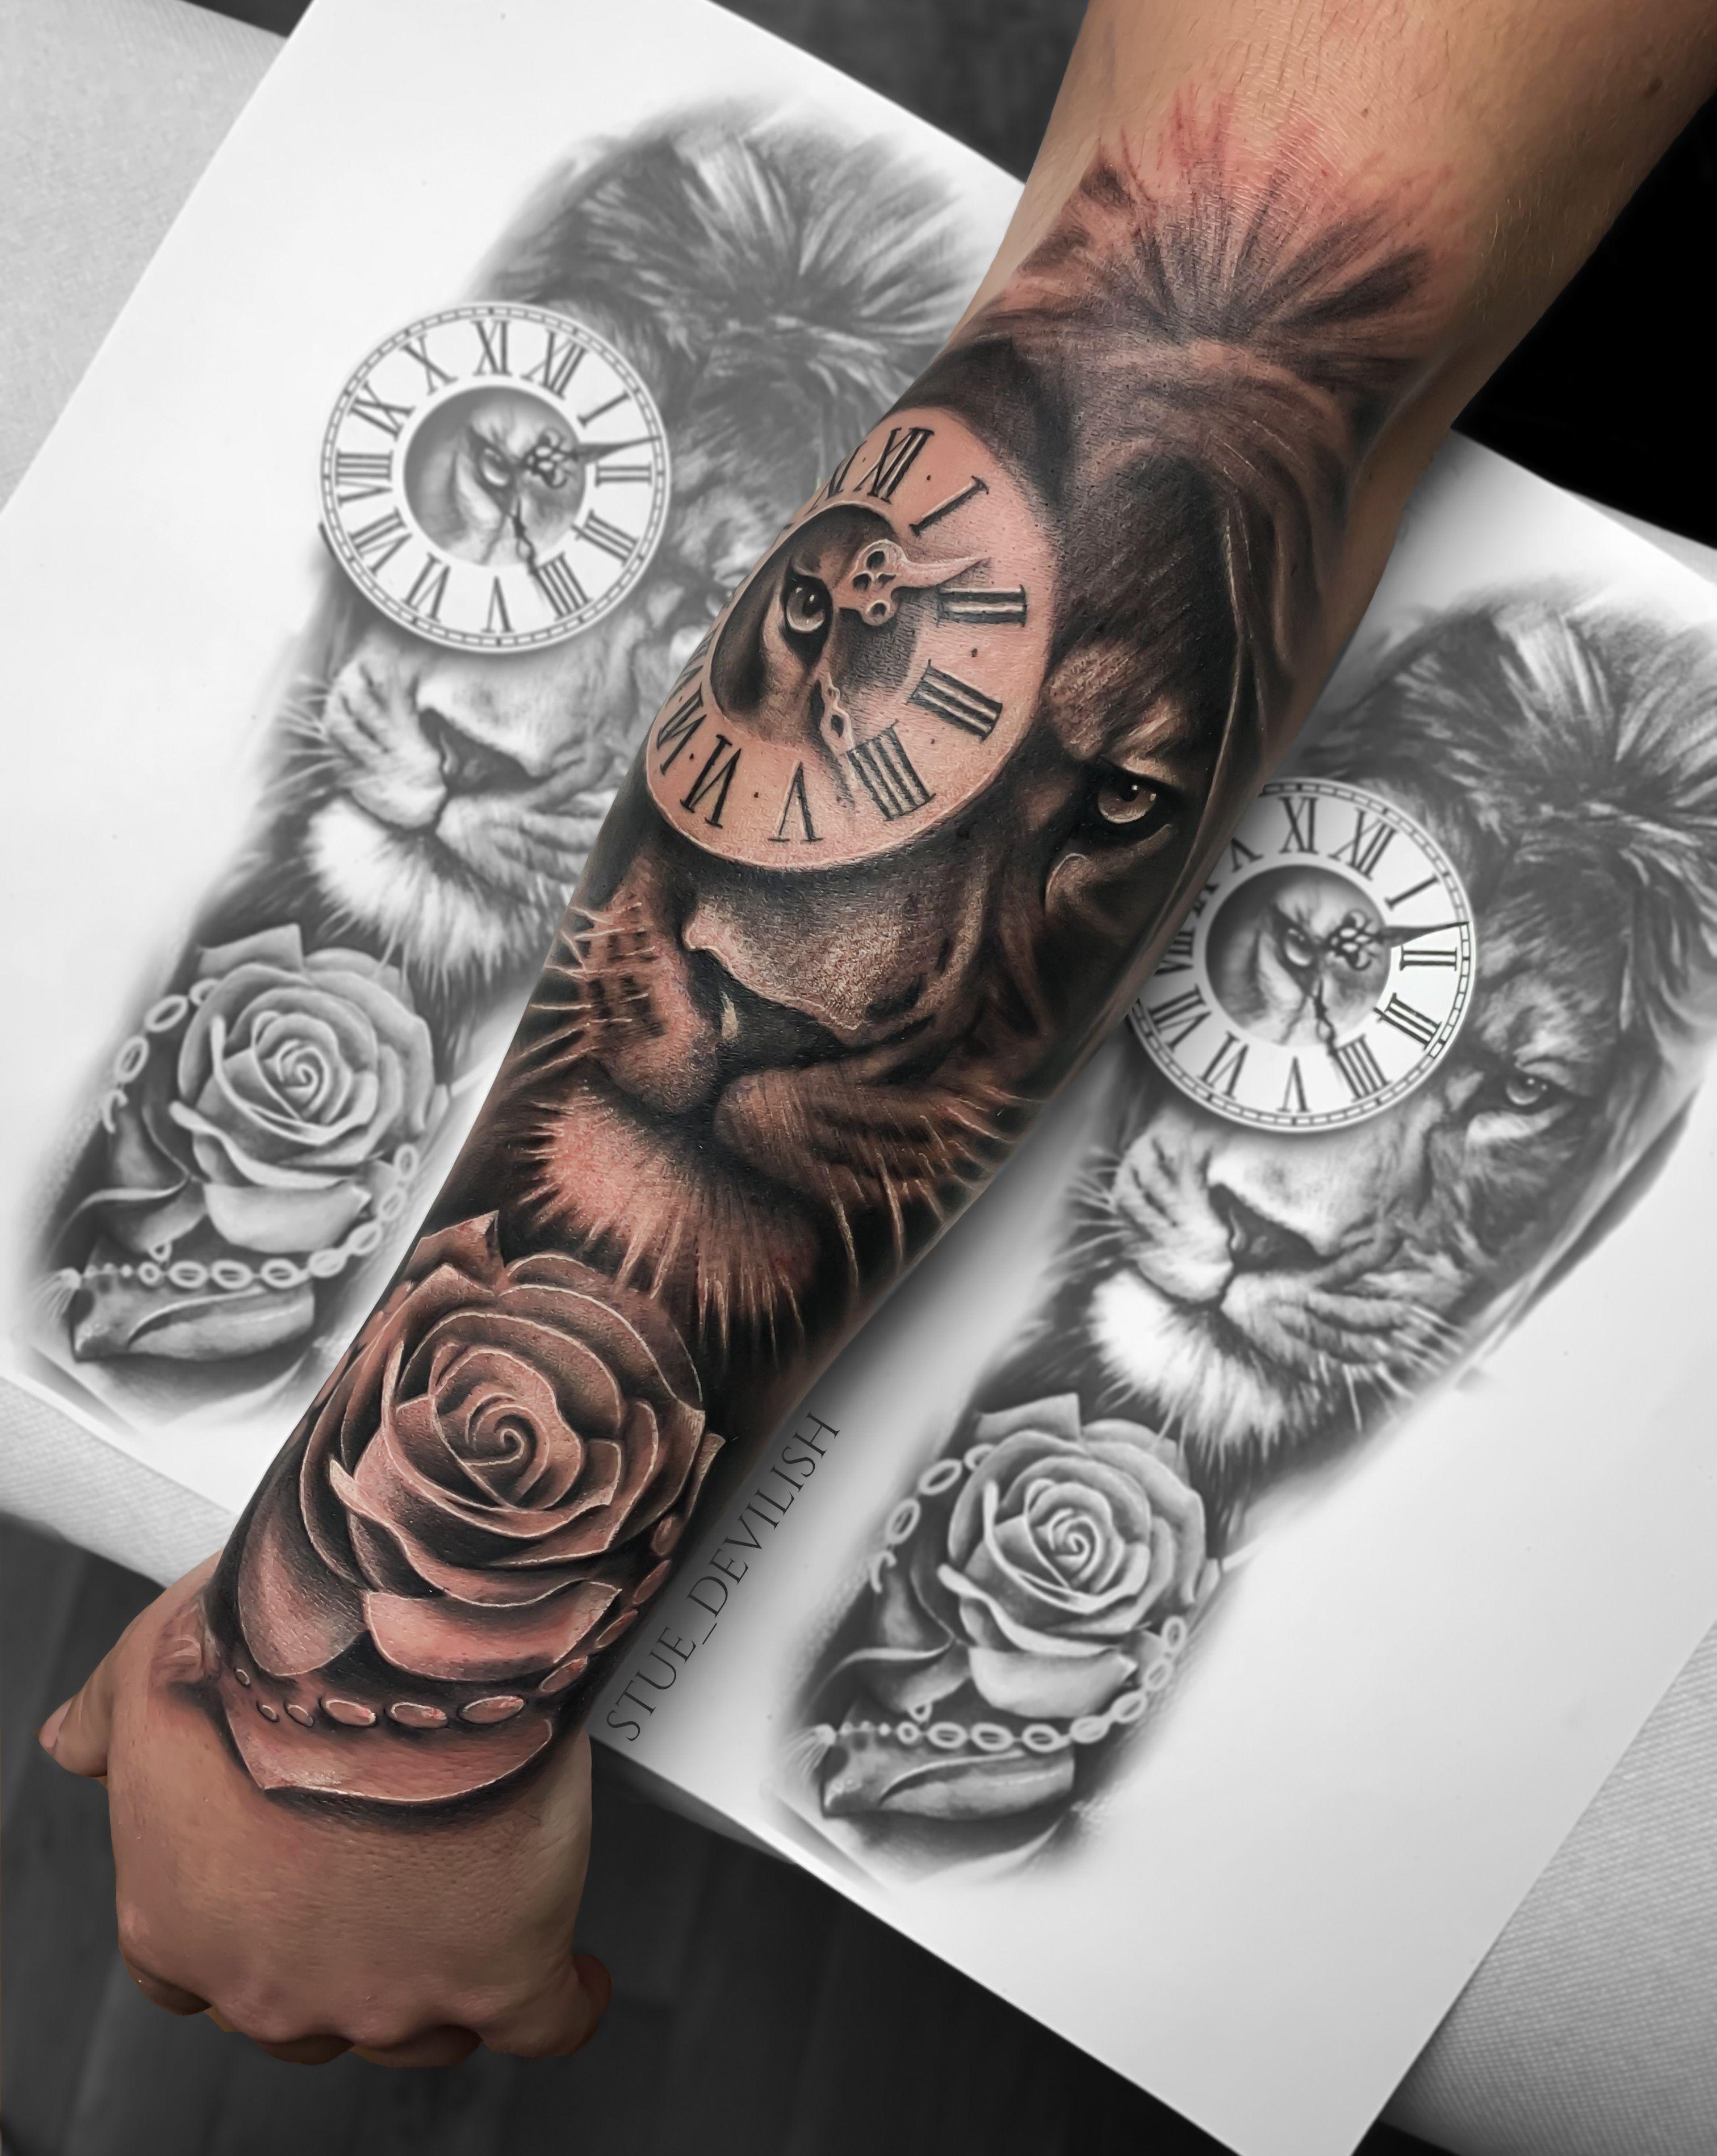 Lion Tatouage Lion Tatouage Manches Tatouage Rose Rose Realiste Stue524 De Tatouage In 2020 Lion And Rose Tattoo Lion Forearm Tattoos Rose Tattoo Sleeve